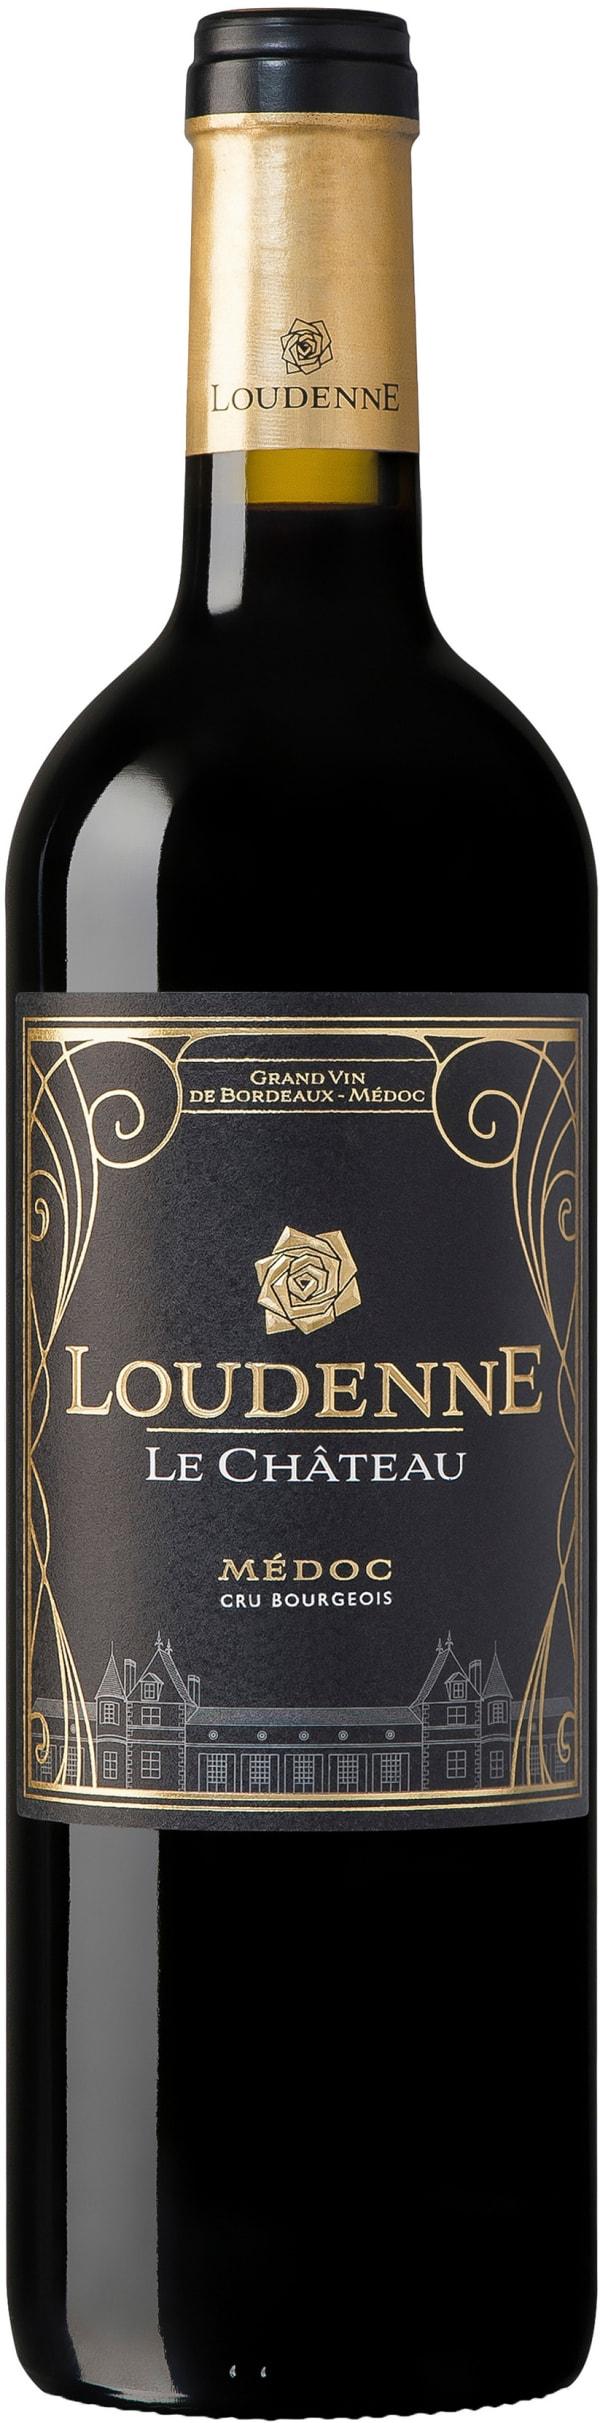 Château Loudenne Rouge 2012